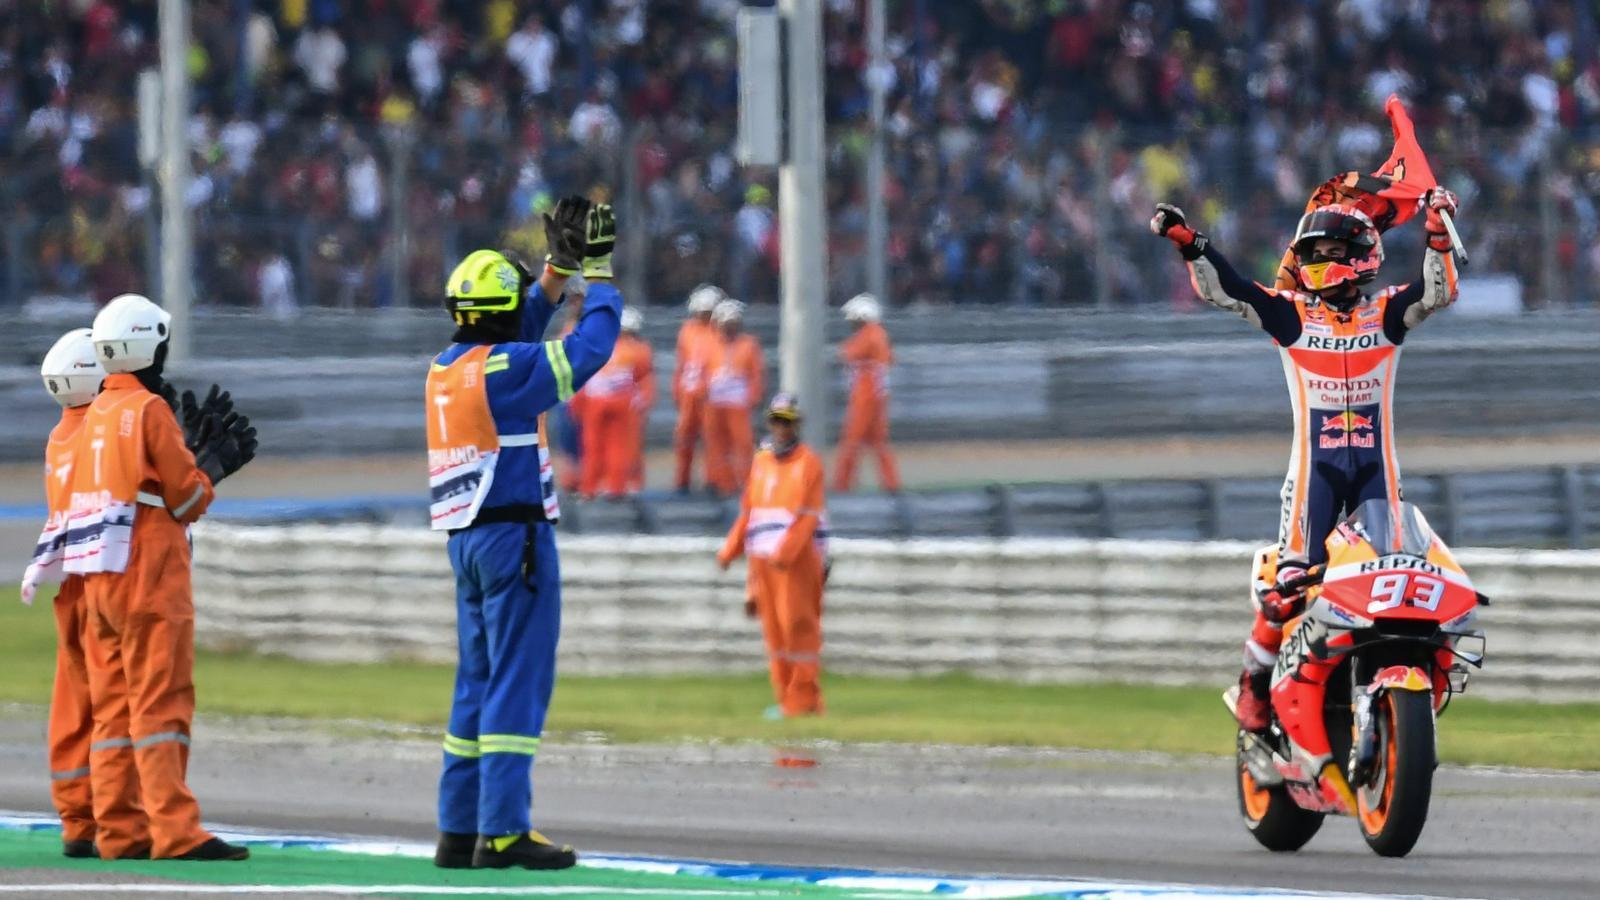 El coronavirus dinamita l'inici del Mundial de MotoGP